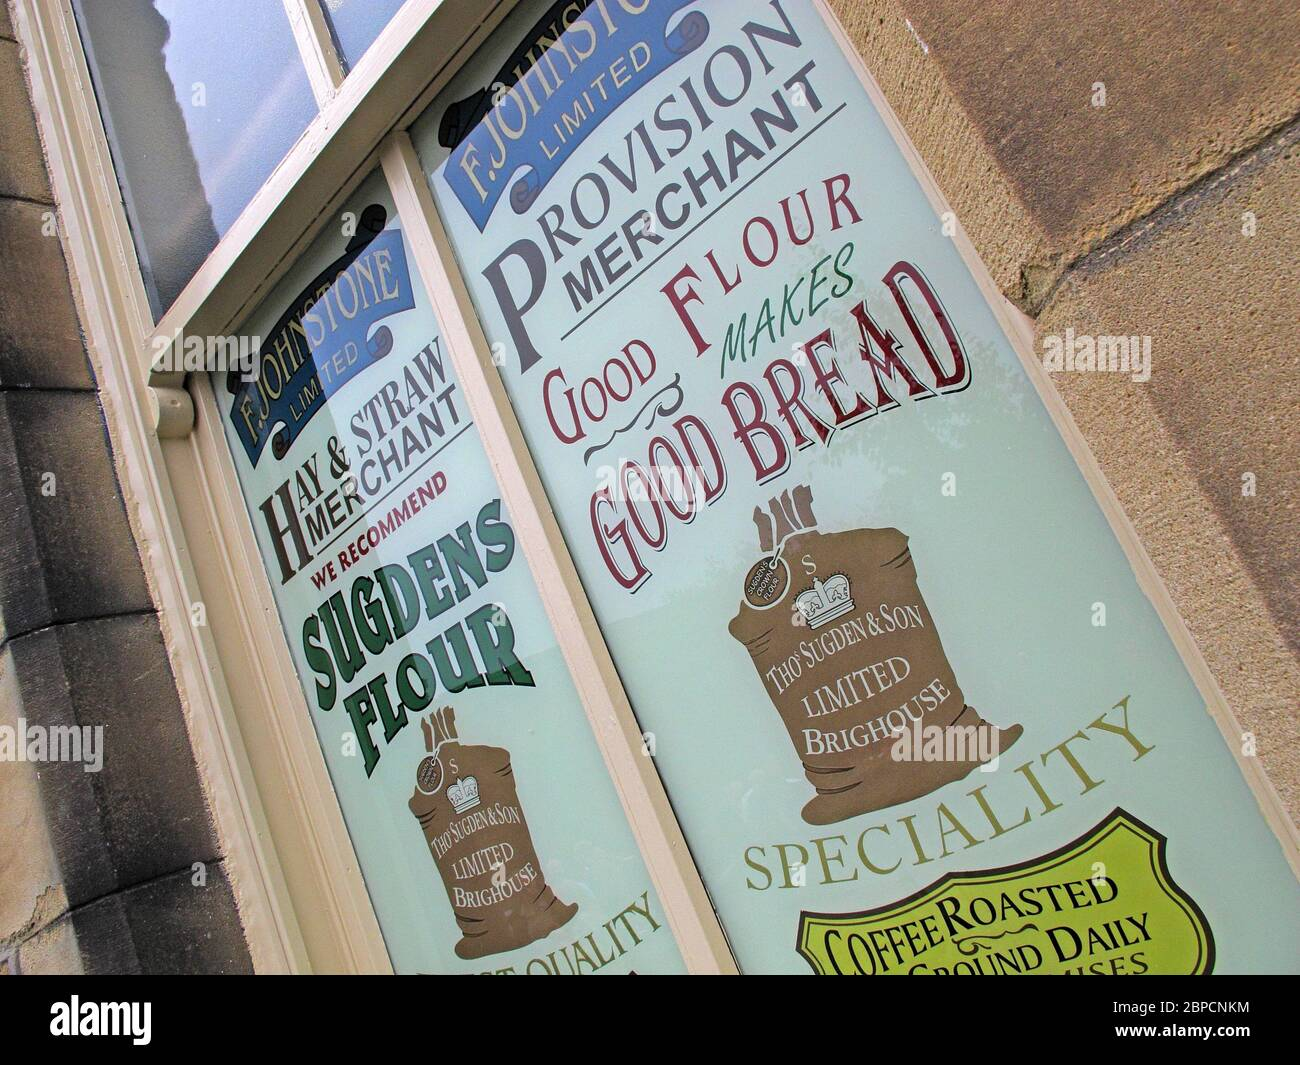 HotpixUK,@HotpixUK,GoTonySmith,F Johnston Limited,Provision Merchants,Brighouse,West Yorkshire,England,UK,good flour,good bread,flour,bread